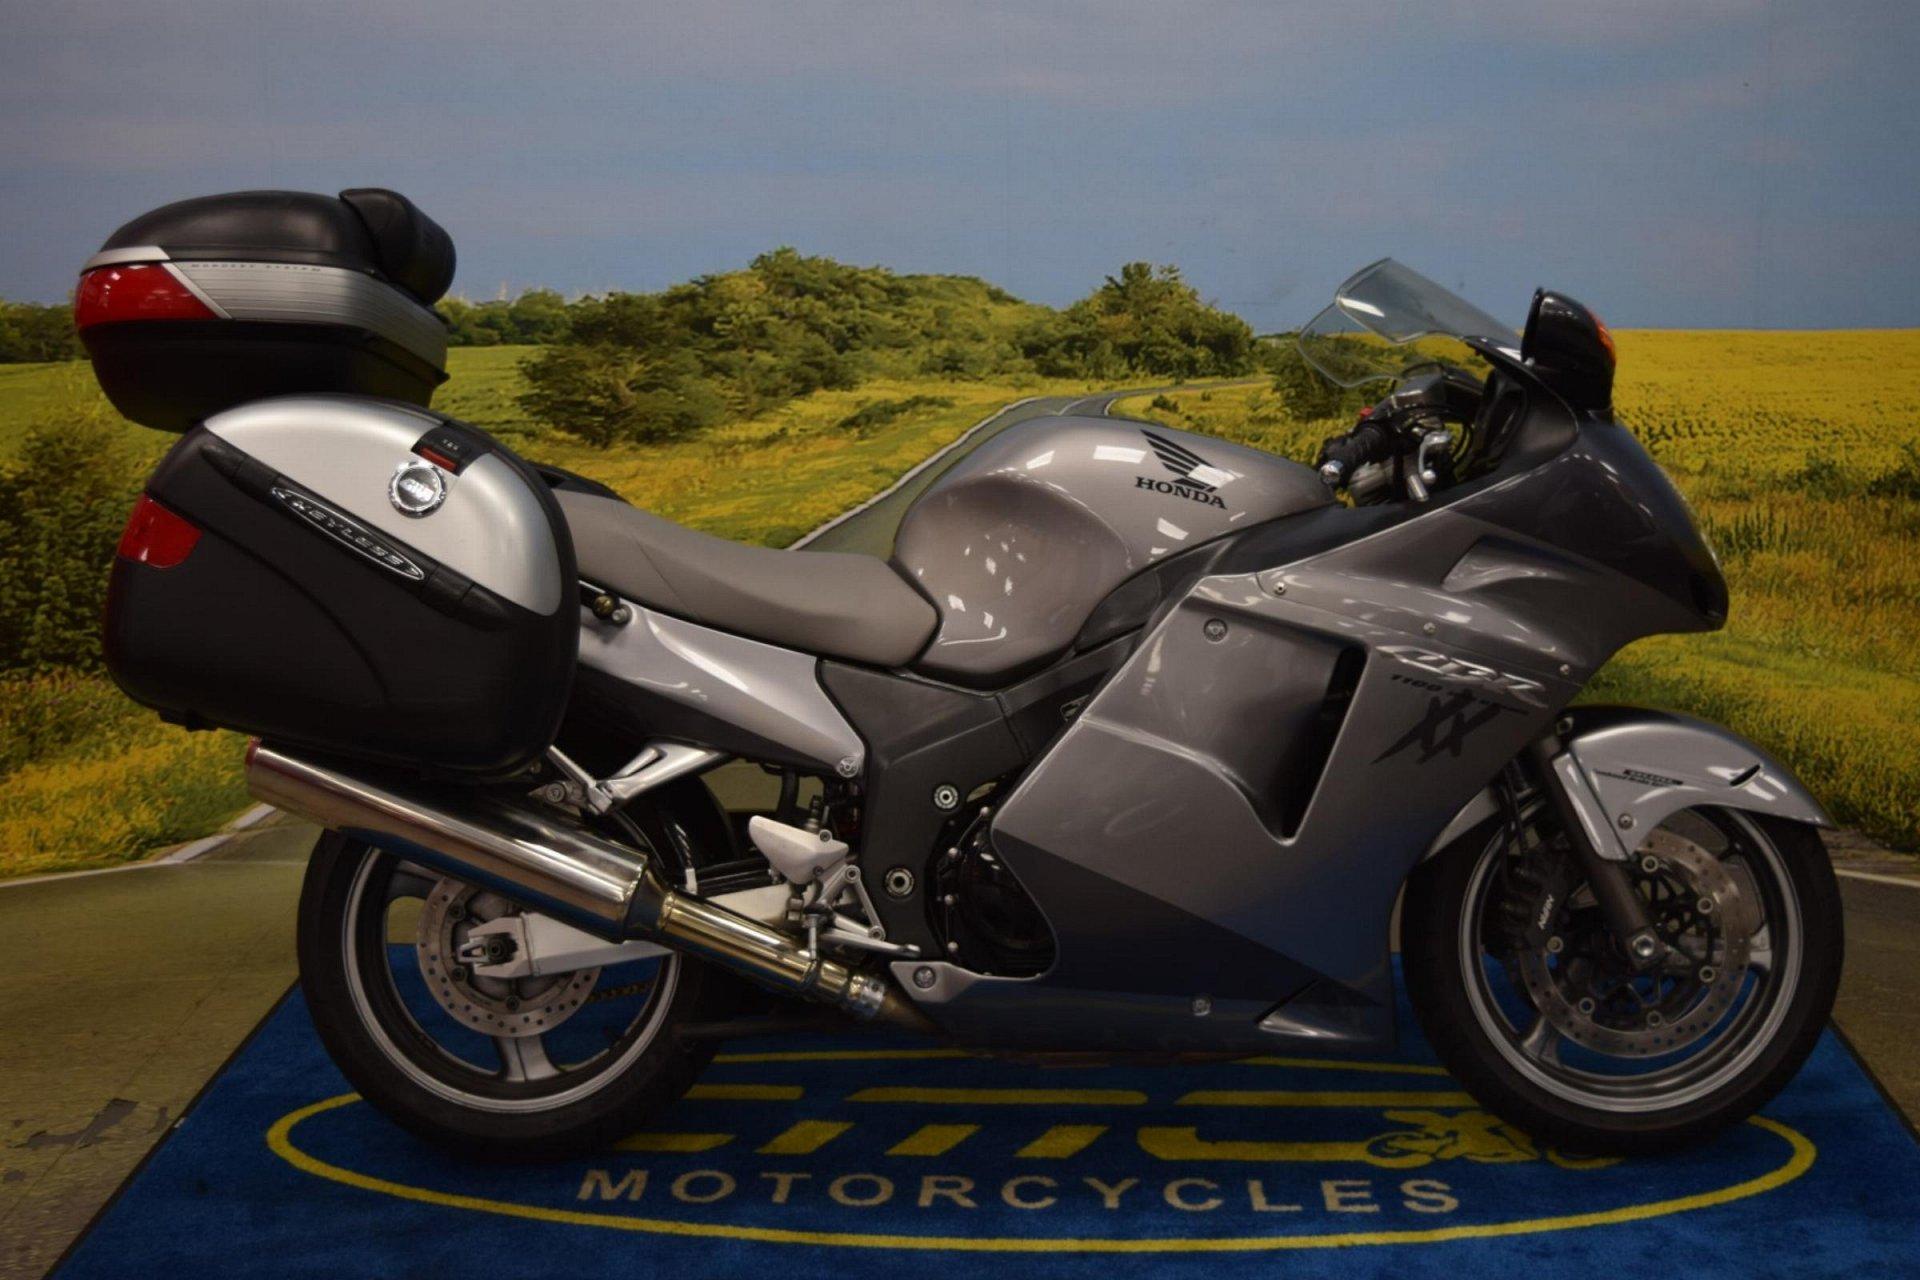 2005 Honda CBR1100XX Super Blackbird for sale in Staffordshire